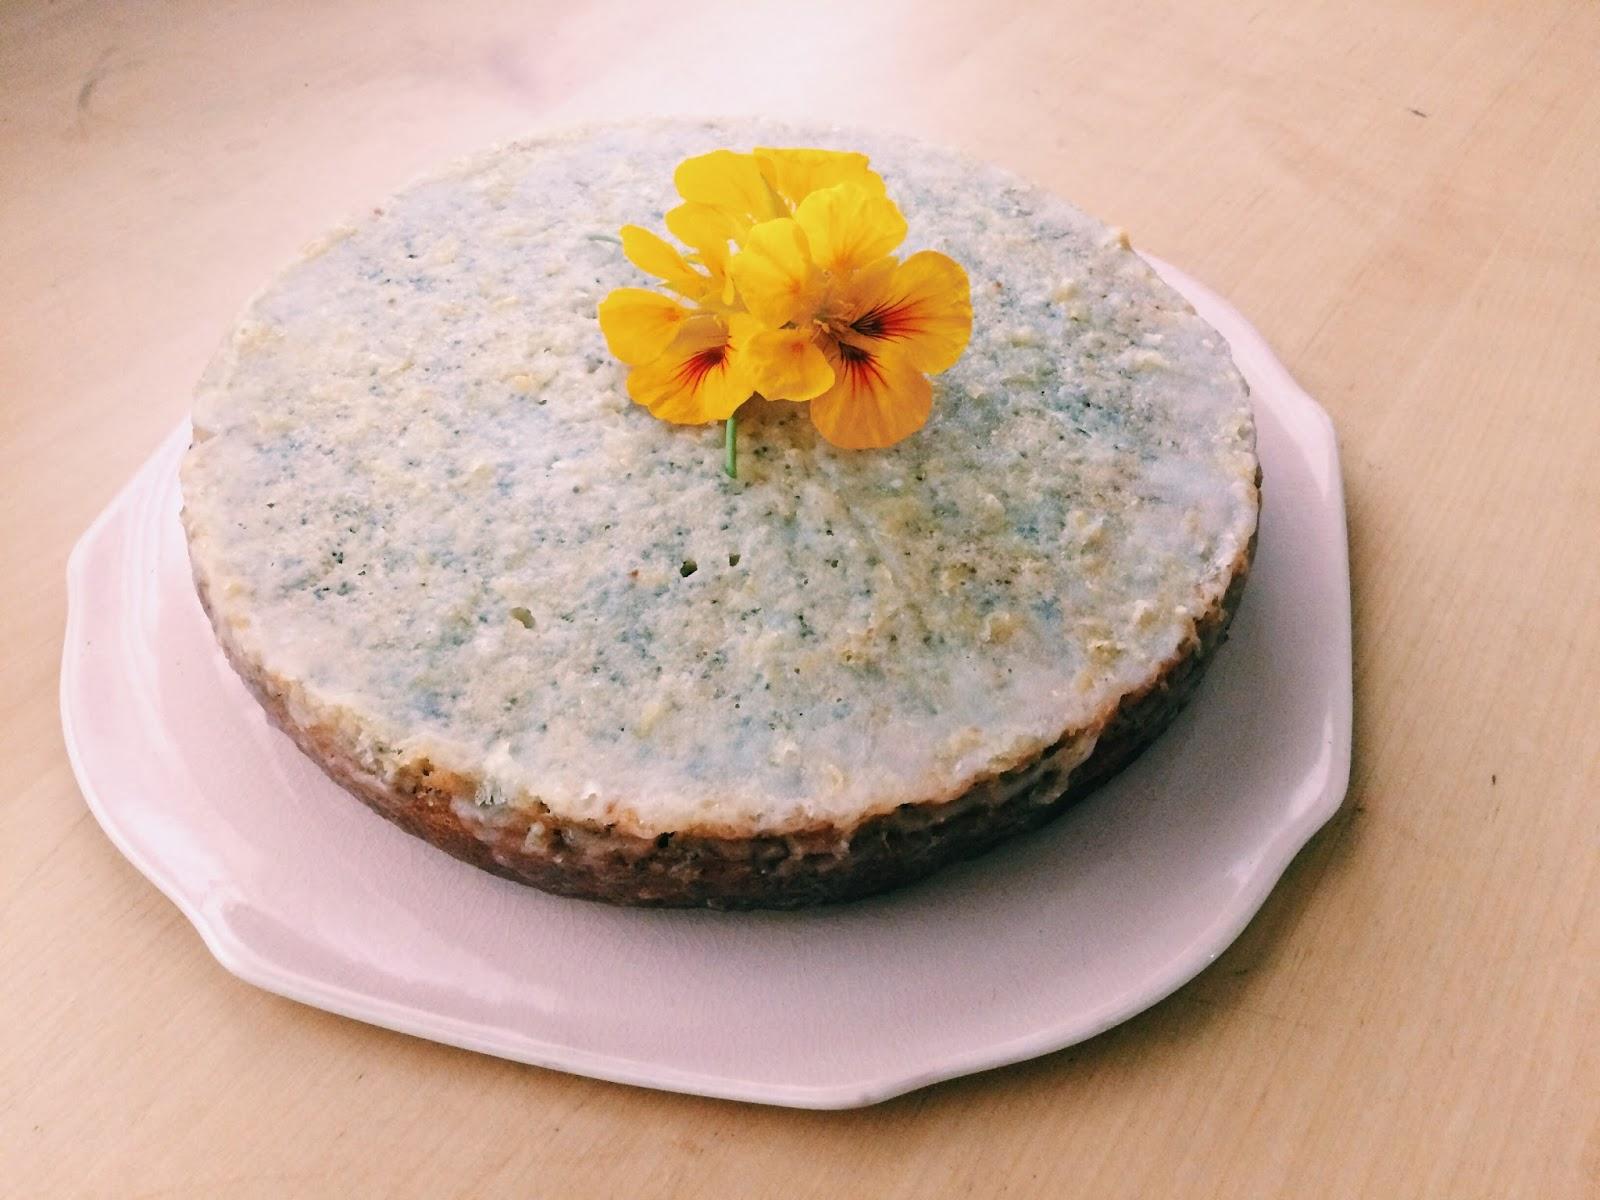 Alice Bakes a Cake: Lemon poppyseed cake